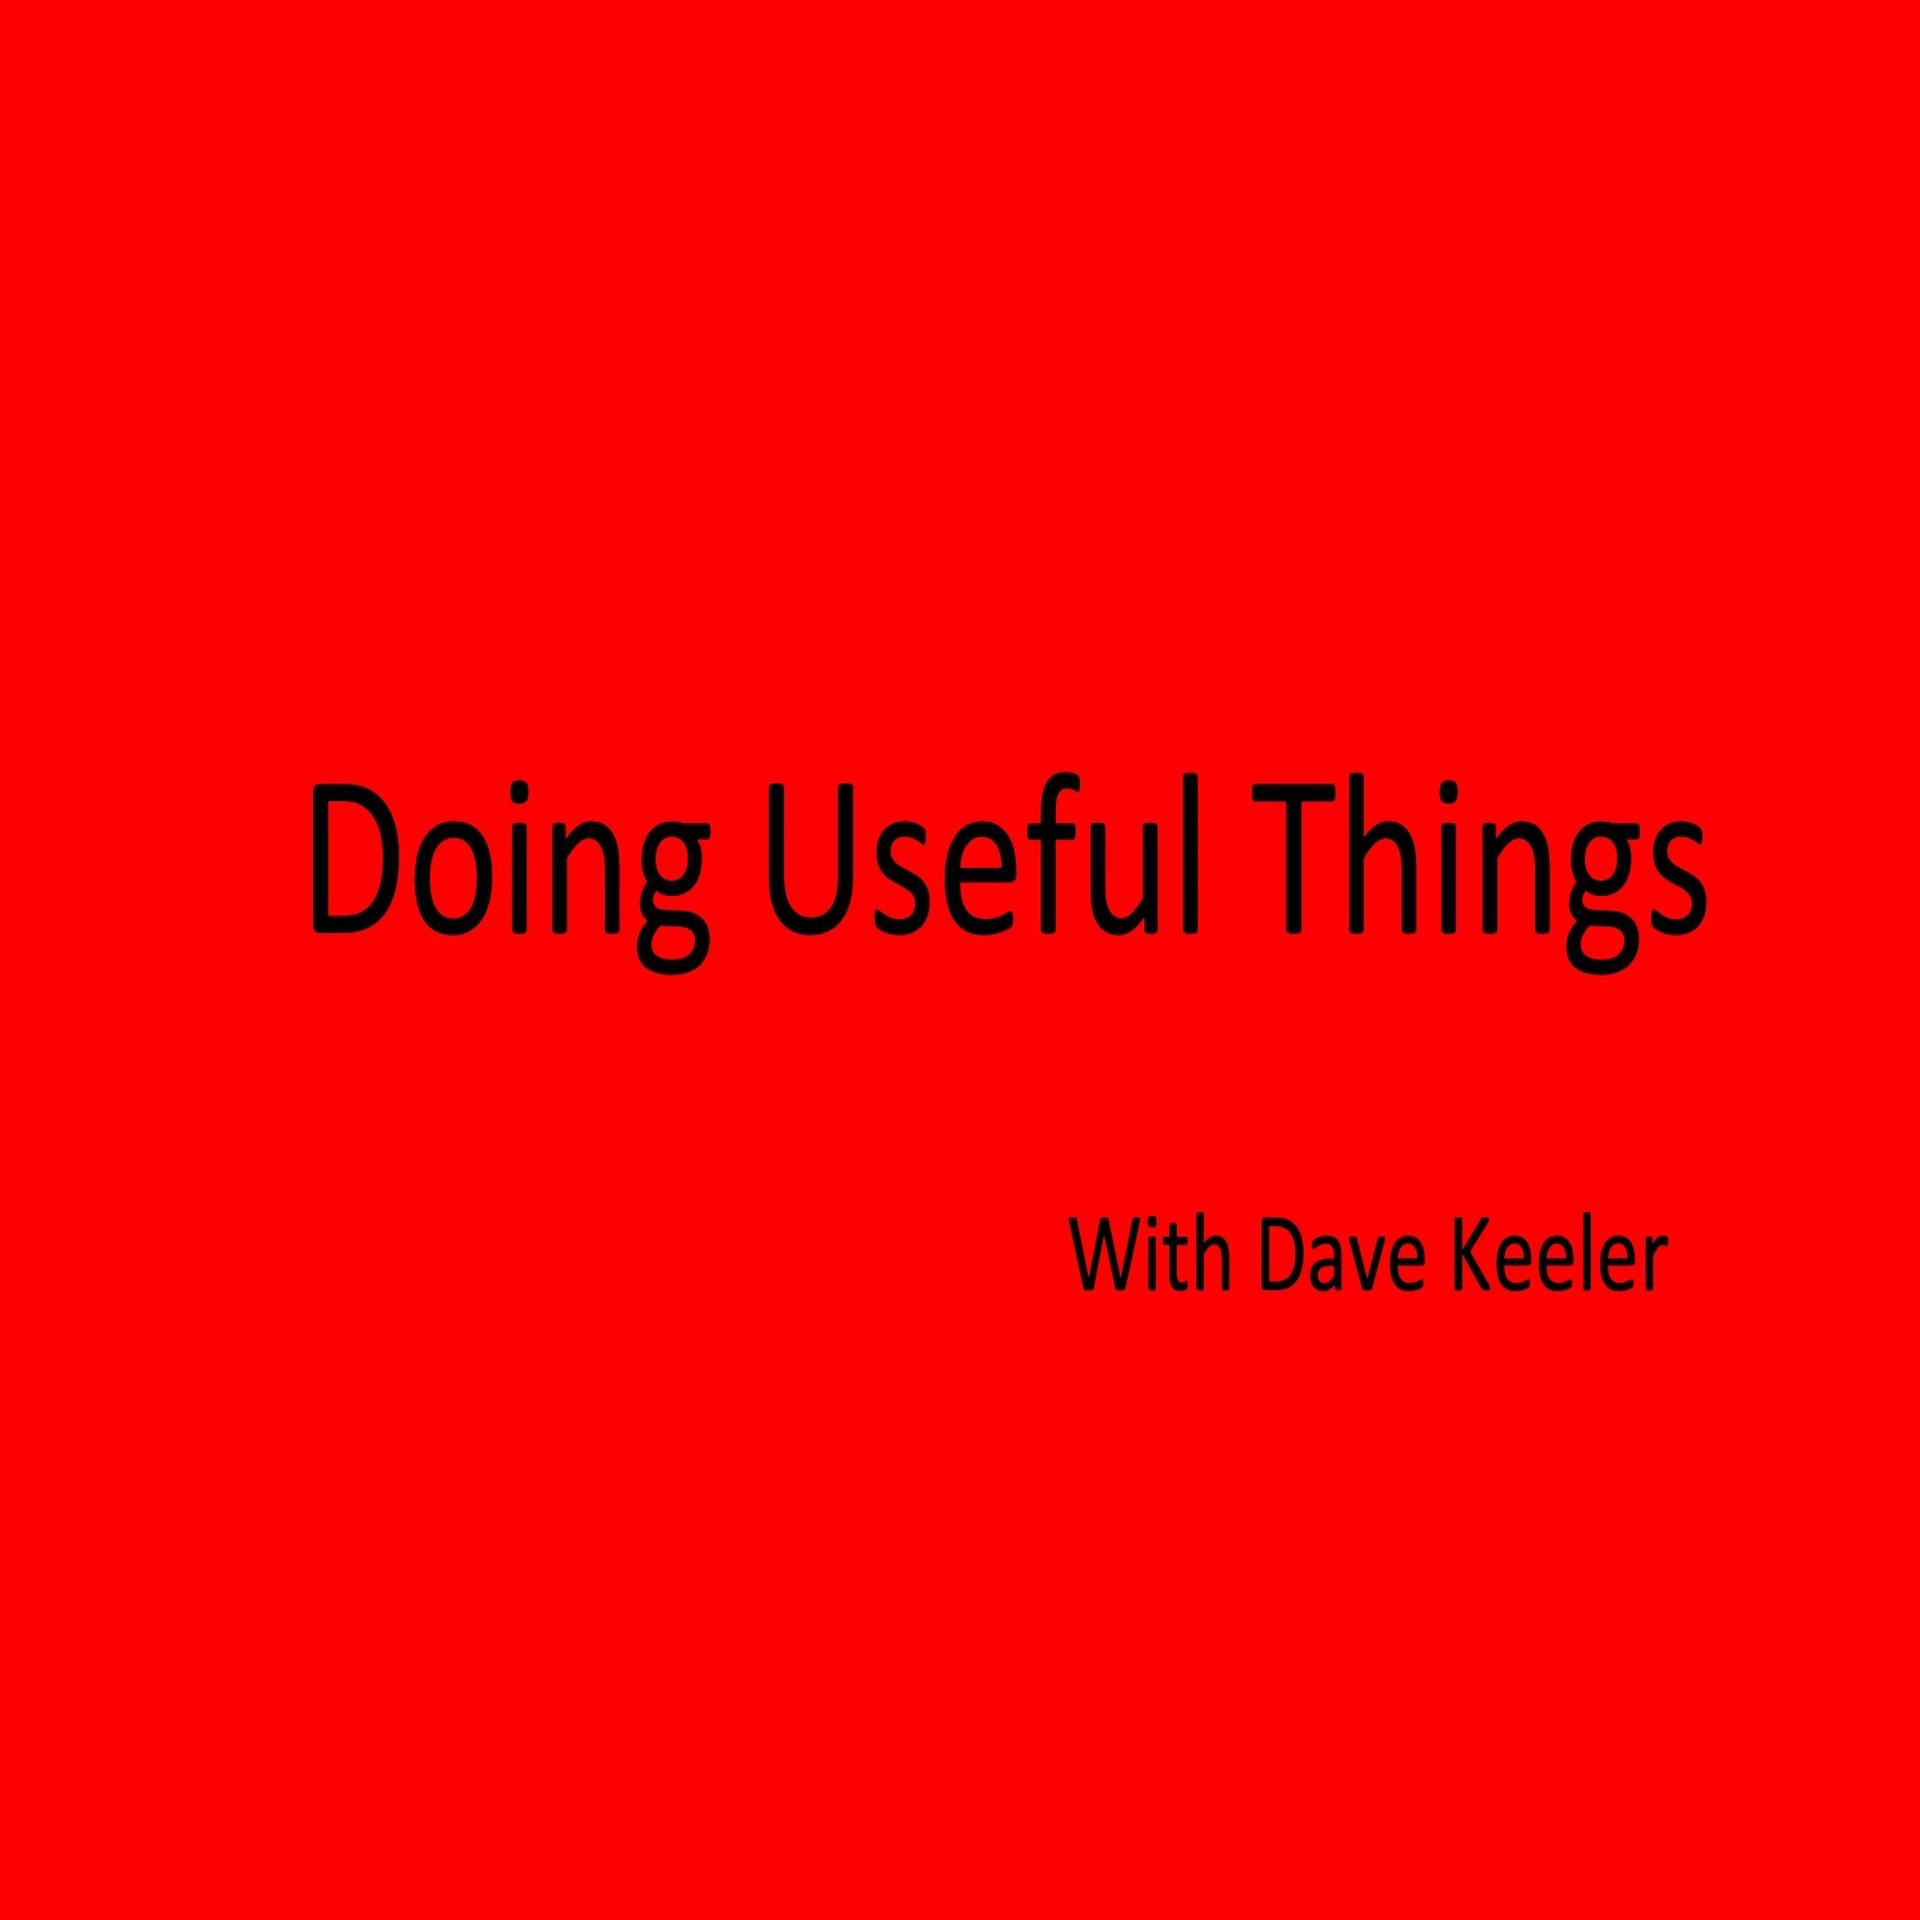 Doing Useful Things